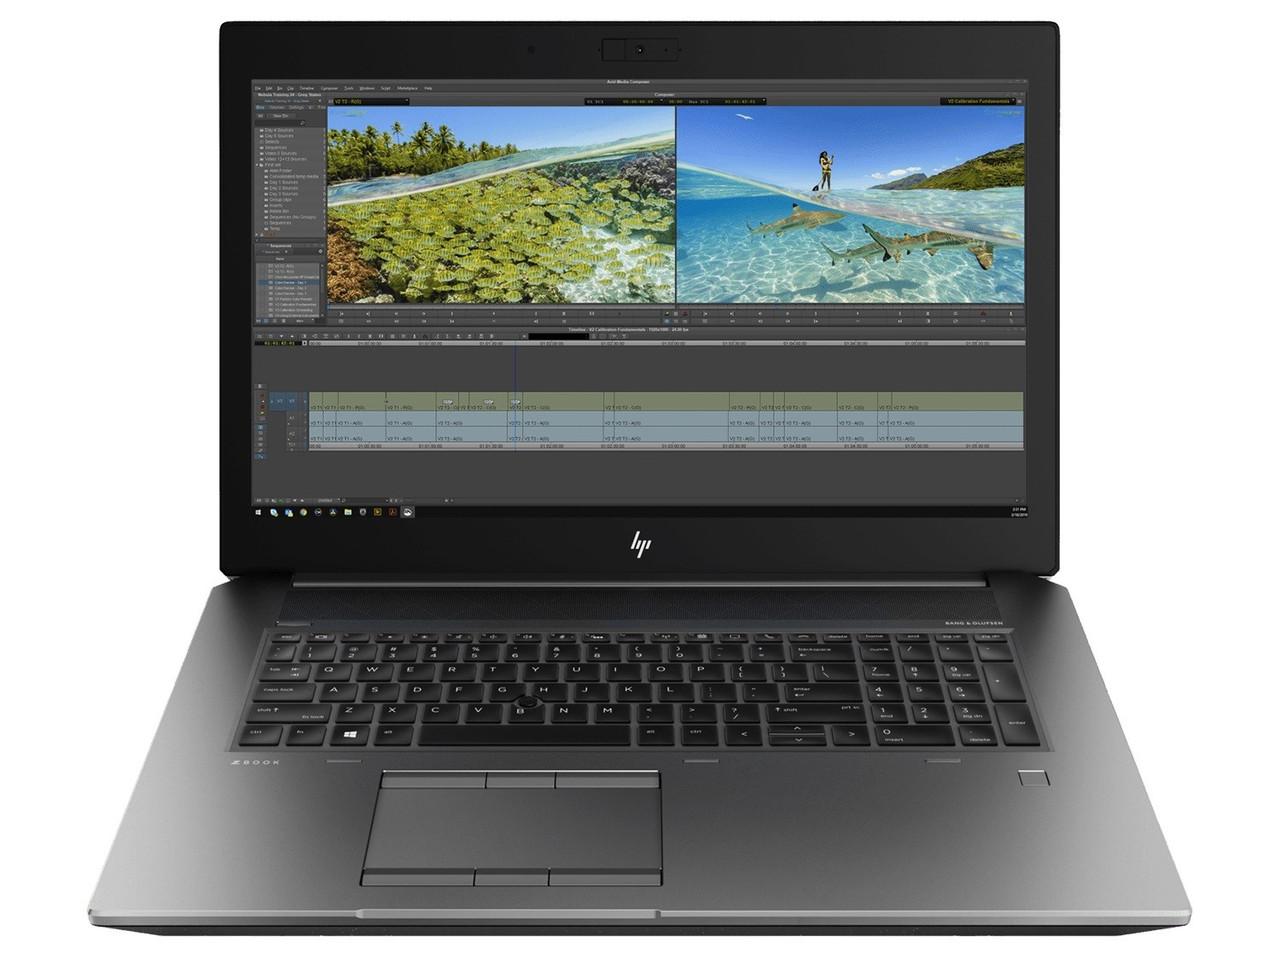 "Ноутбук HP ZBook 17 G6 (6CK22AV_V21); 17.3"" UHD (3840x2160) IPS LED матовый / Intel Core i7-9750H (2.6 - 4.5 ГГц) / RAM 32 ГБ / HDD 2 ТБ + SSD 1 ТБ /"